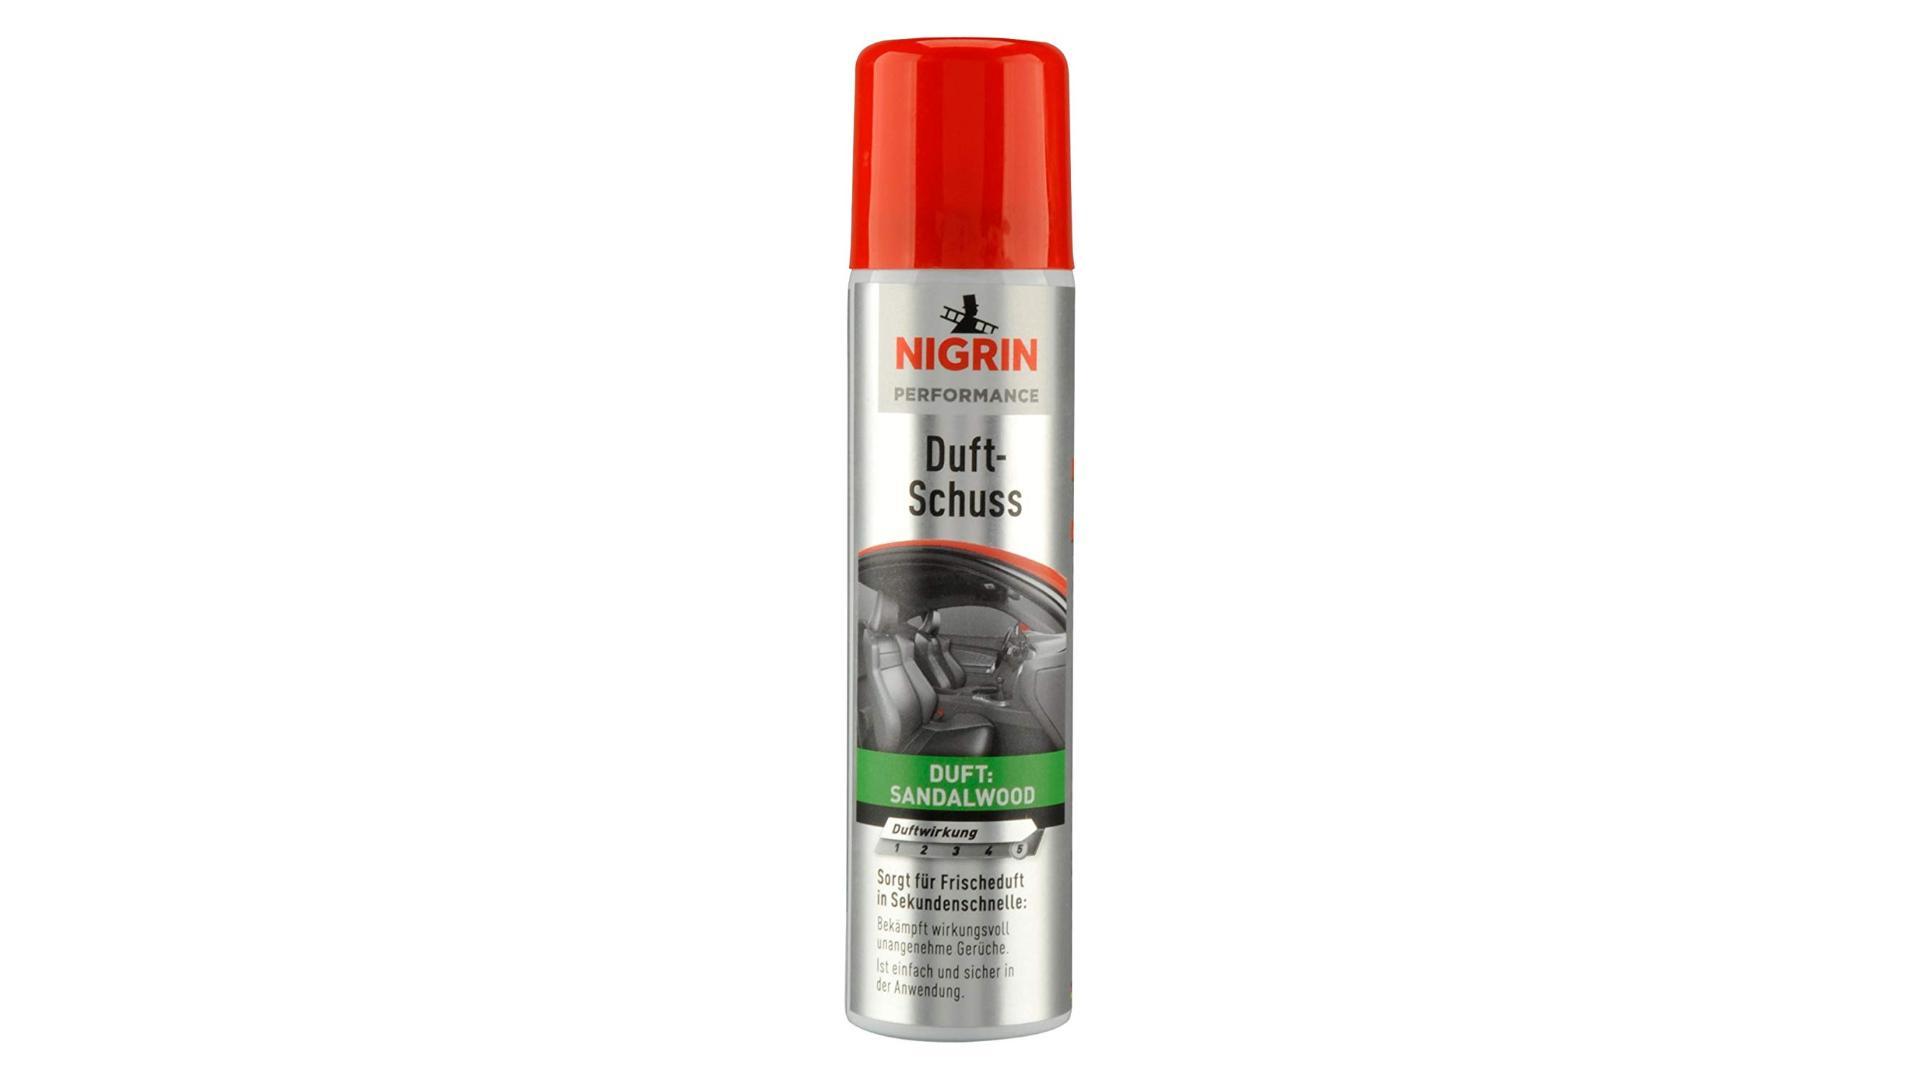 NIGRIN Sandalwood Air Freshener 75ml spray